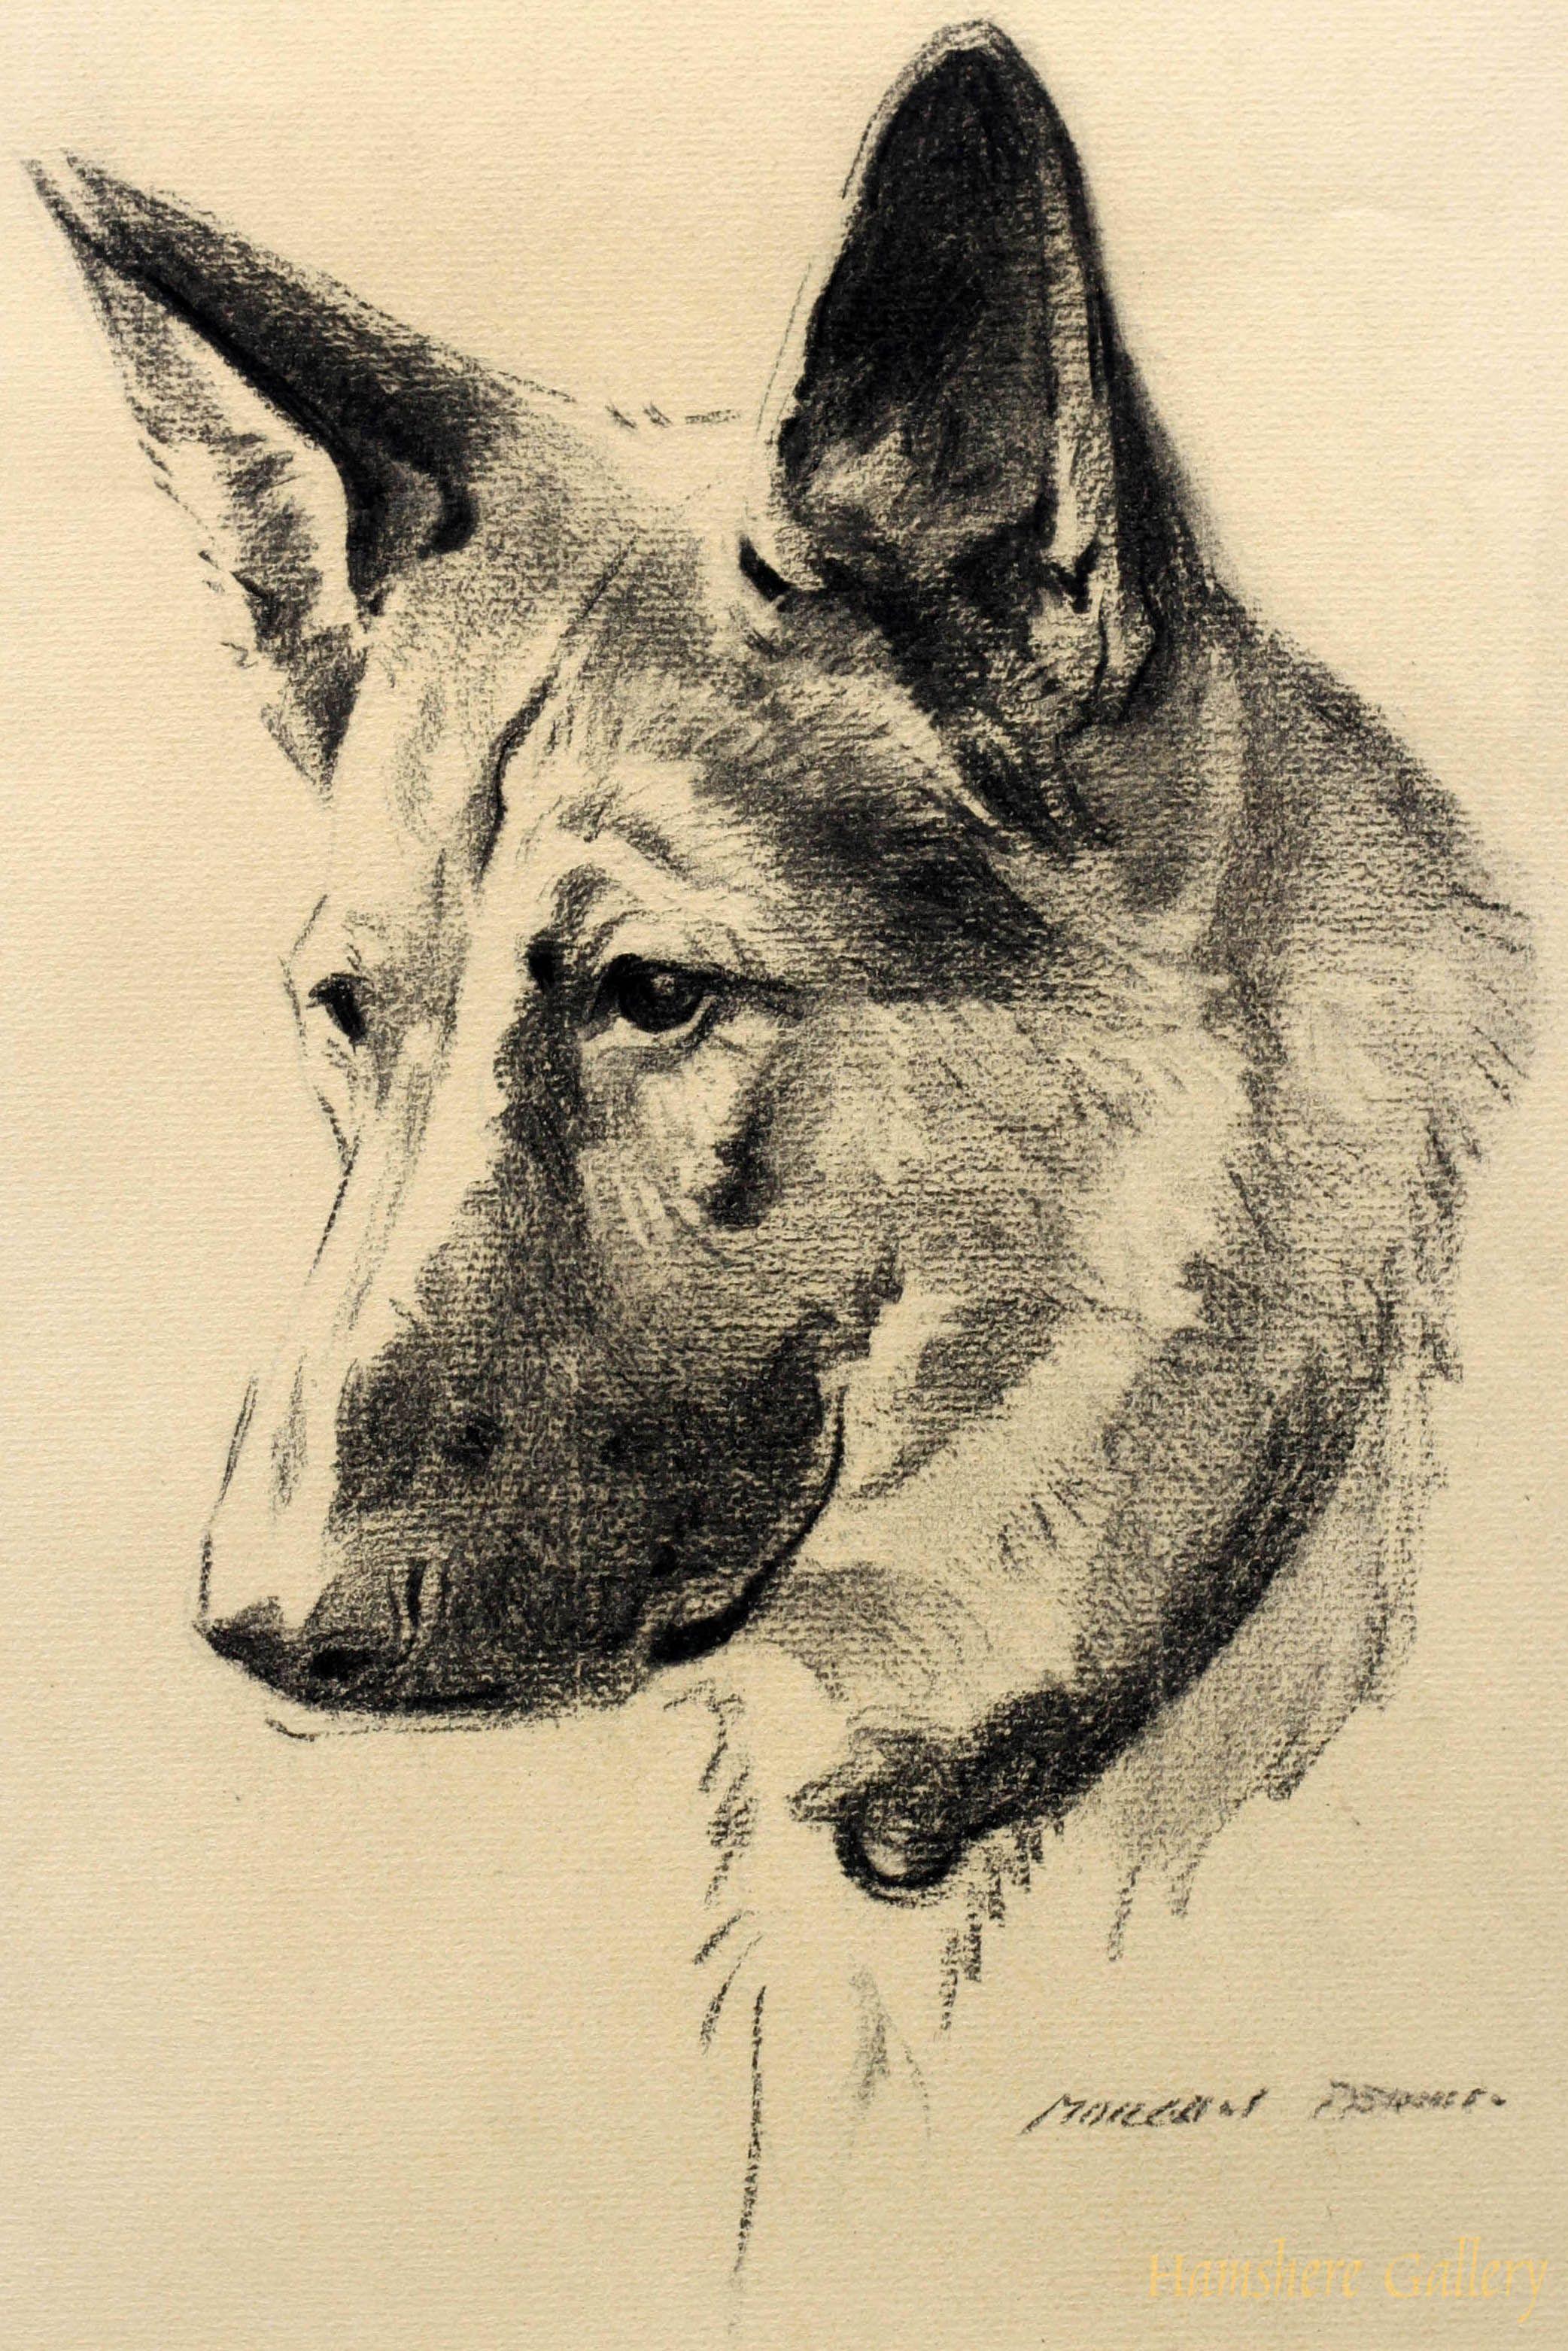 Morgan dennis illustrateur chien berger allemand - Dessin de chien berger allemand ...